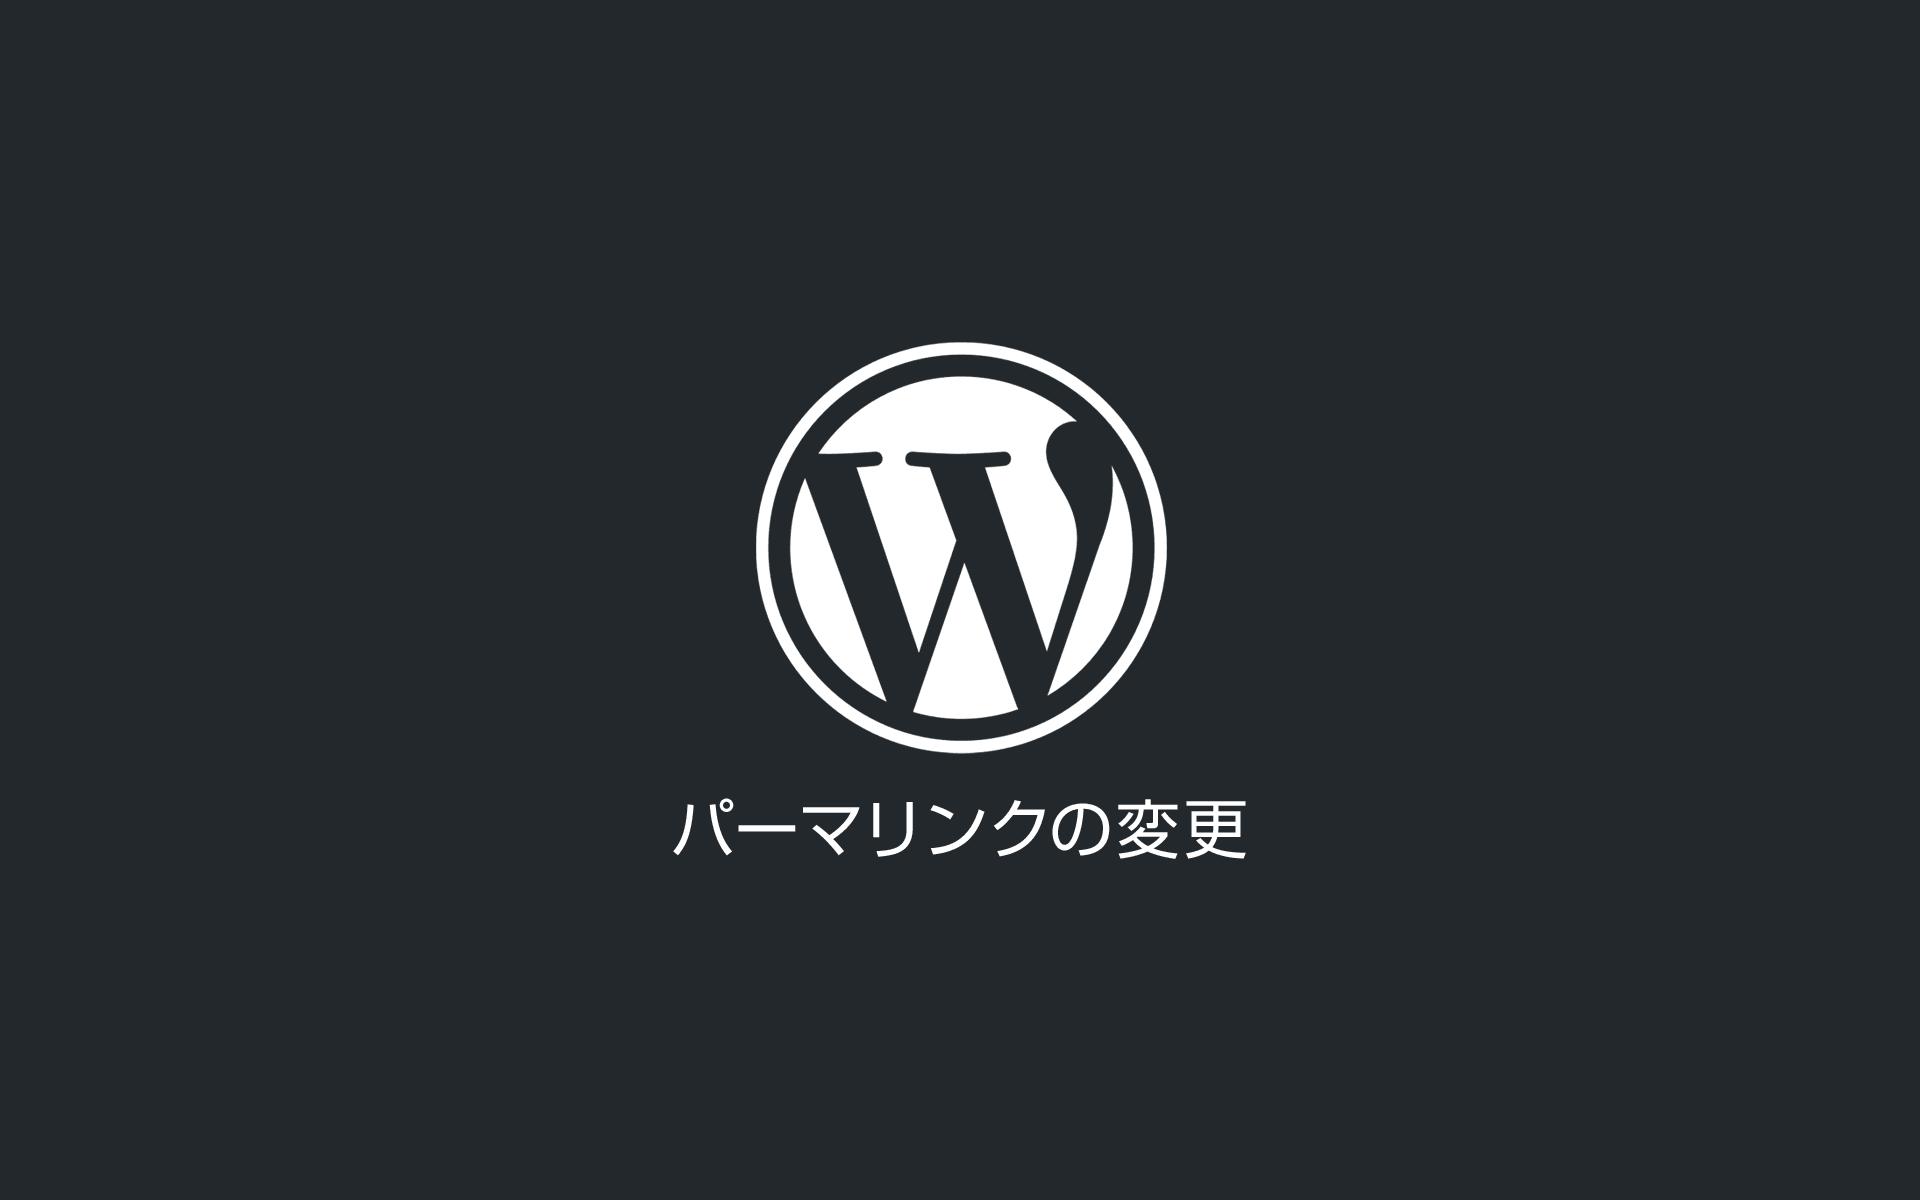 WordPressのパーマリンクを変更して301リダイレクト処理